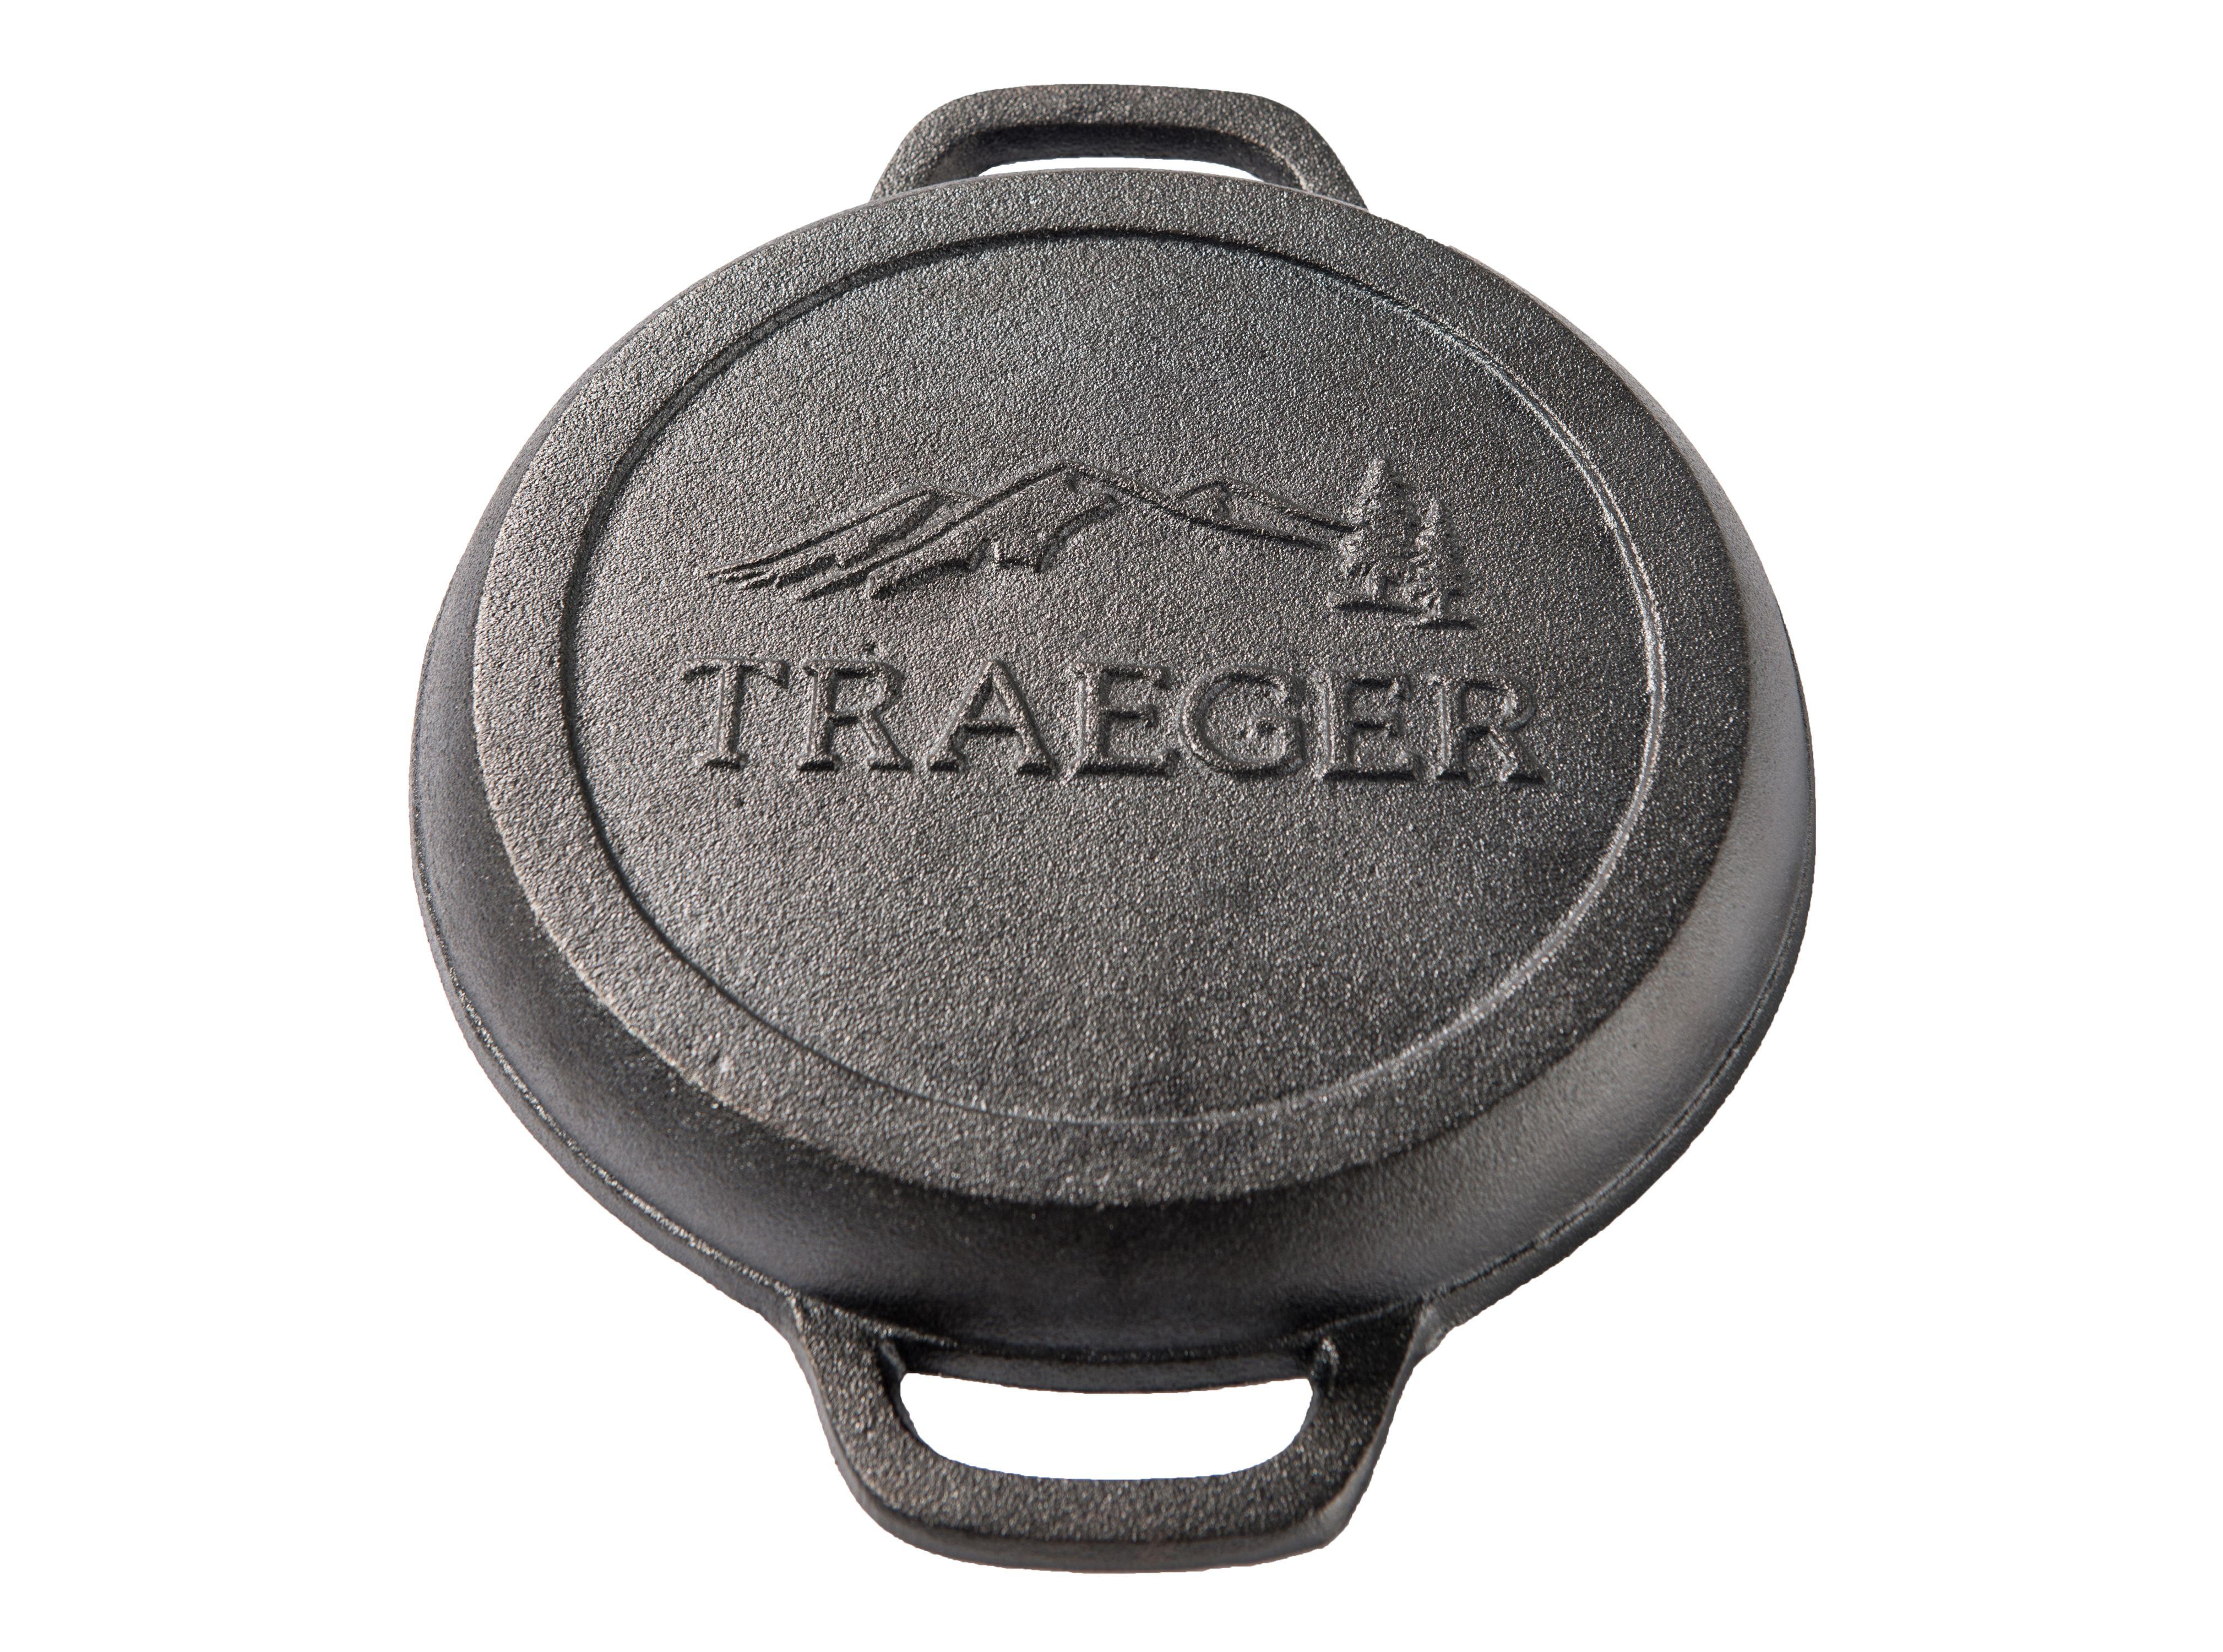 Traeger | Cornbread Wedge Pan | Gietijzer